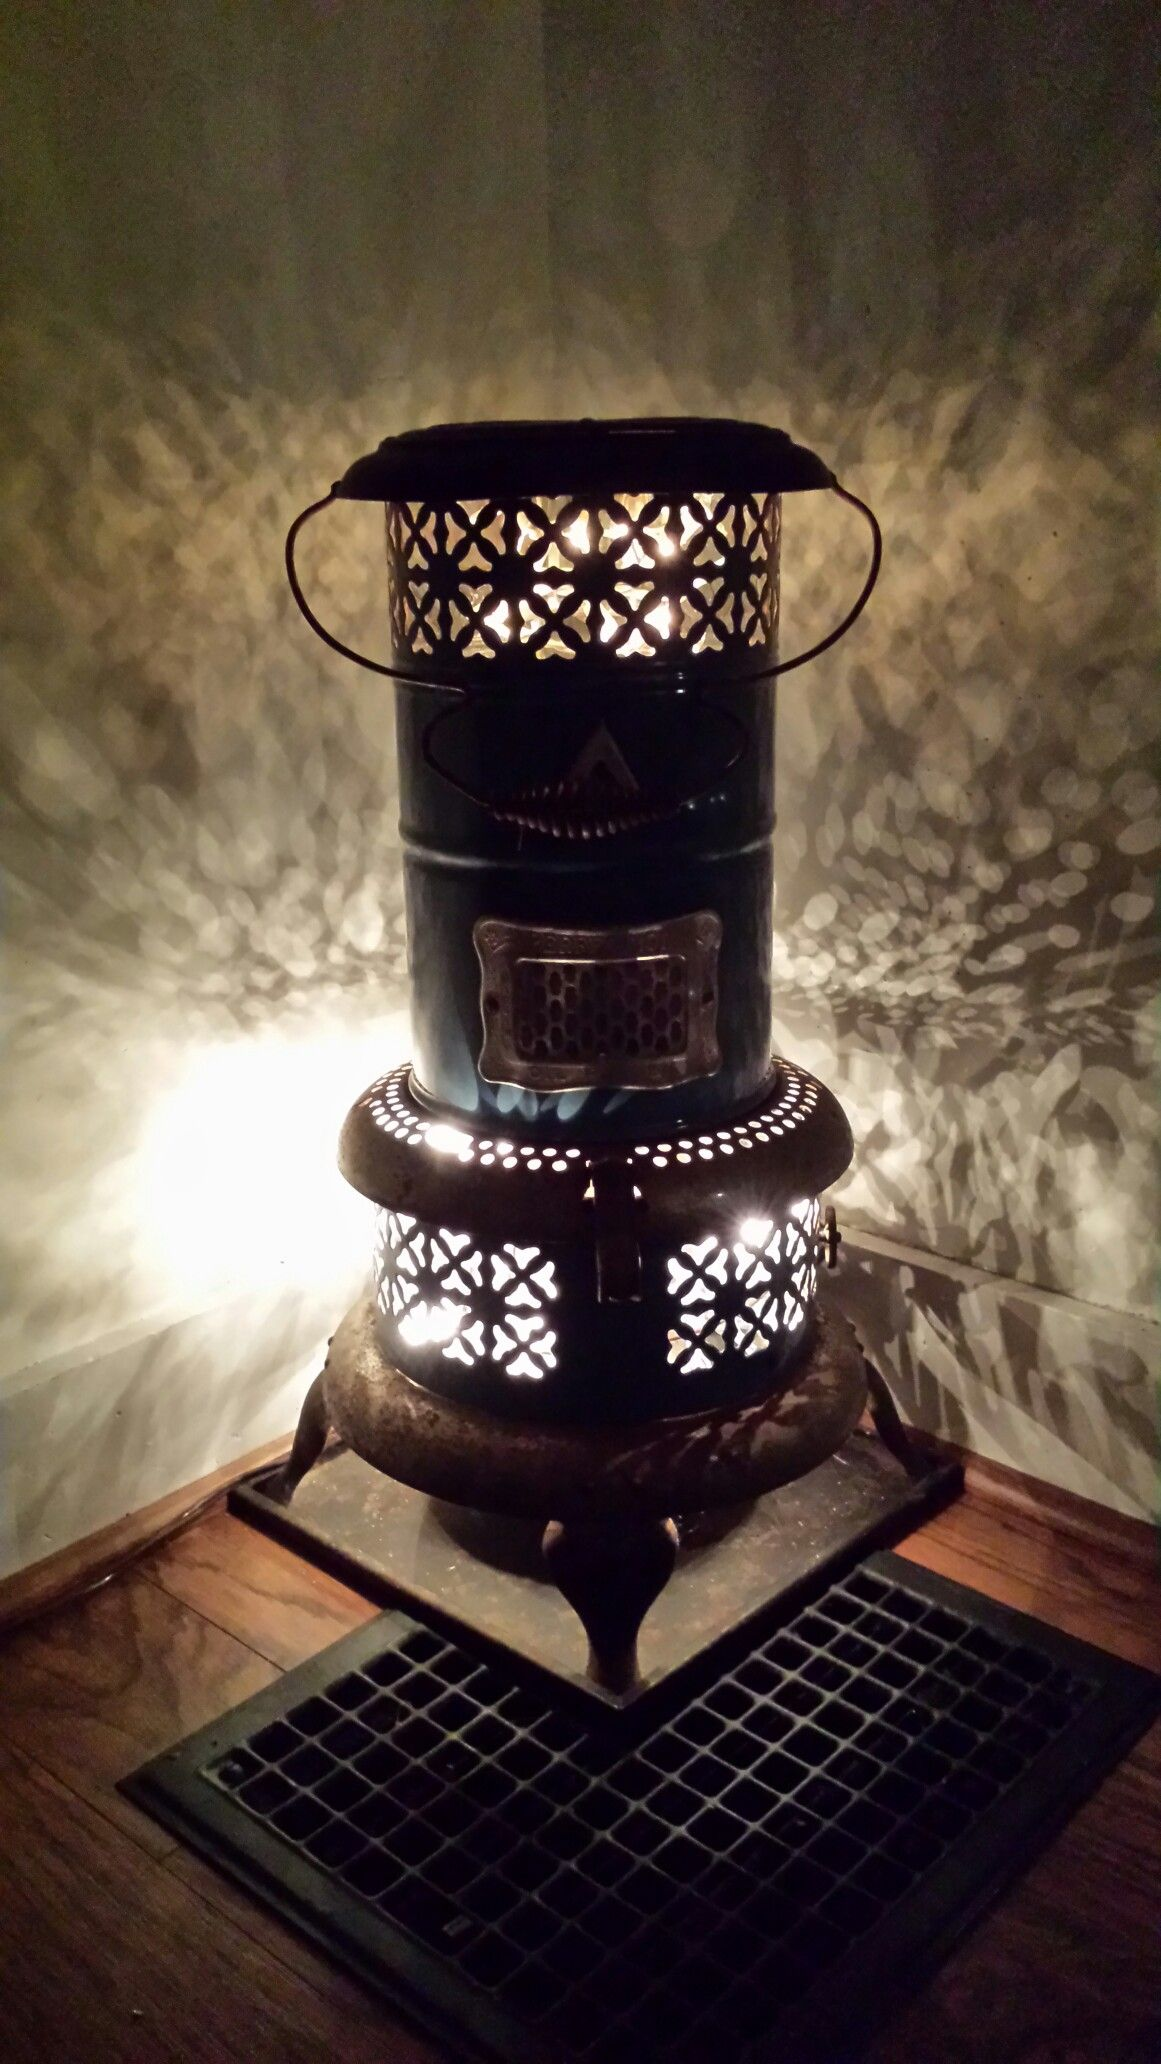 Antique Kerosene Heater With Lights Added For Vintage Decor